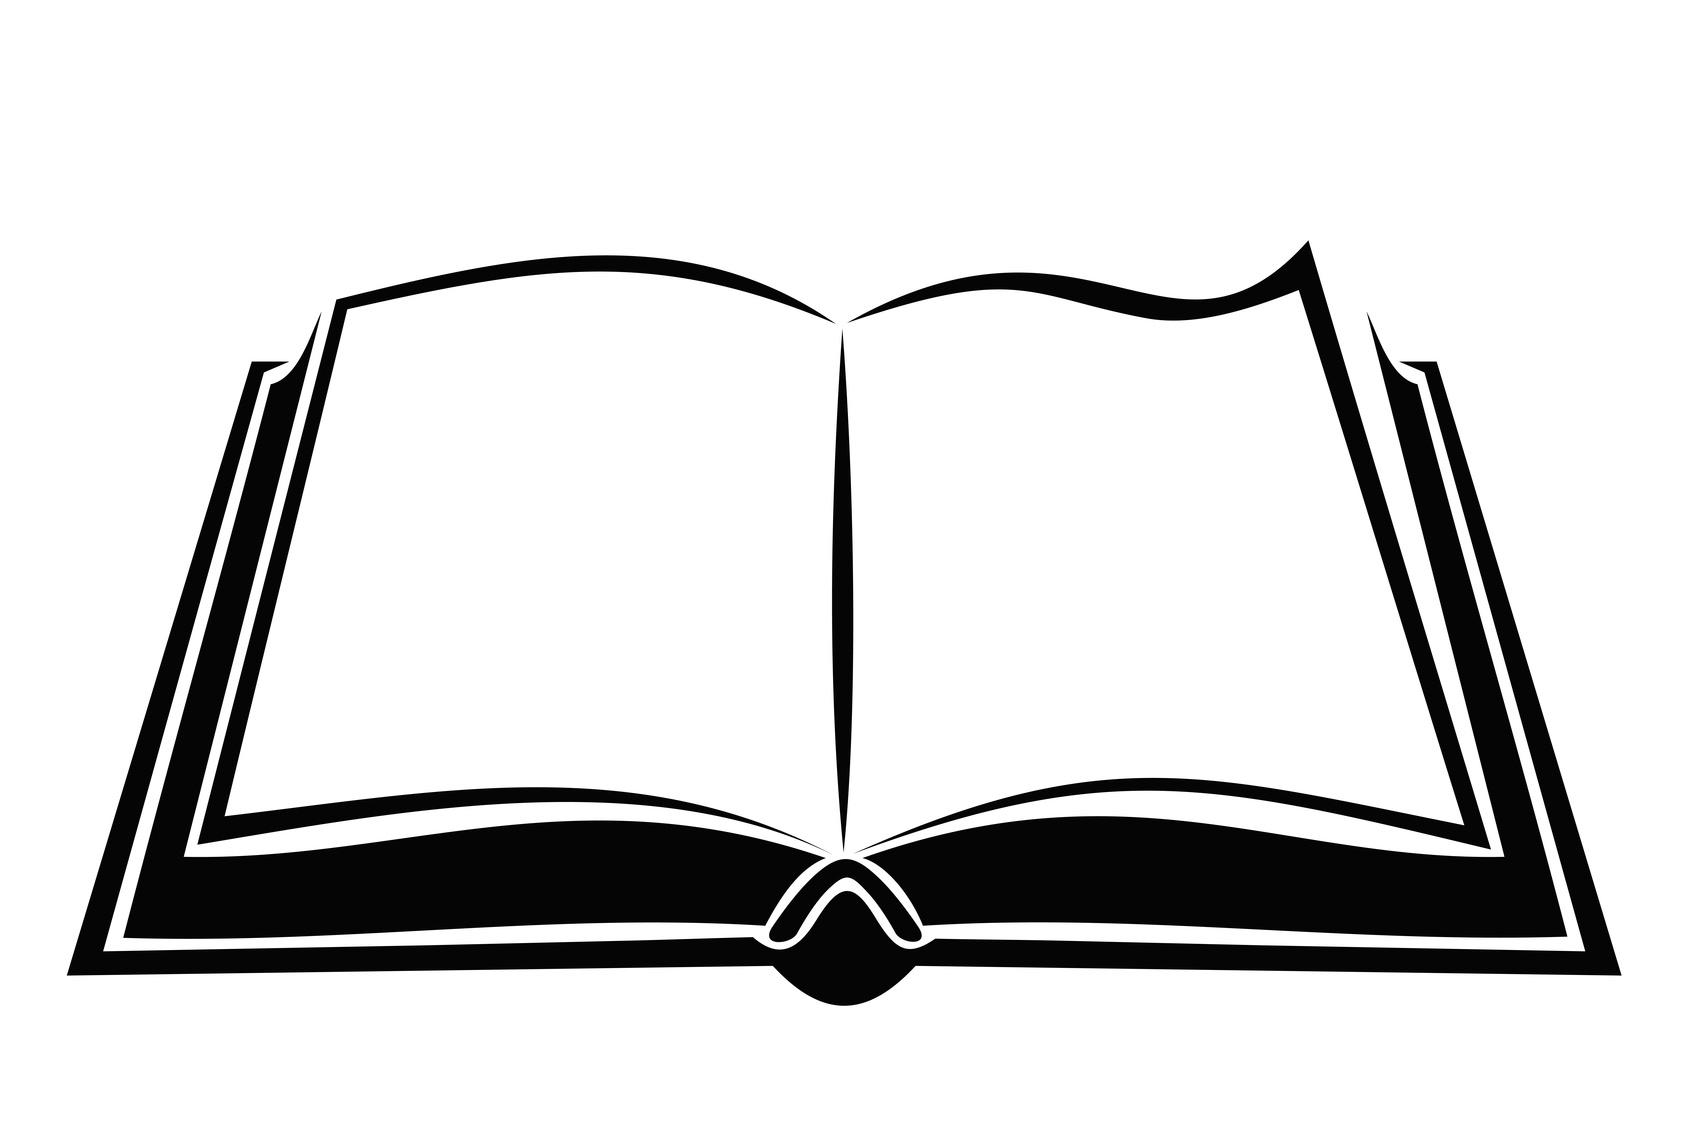 Free Open Book Clip Art Png, Download Free Clip Art, Free Clip Art.